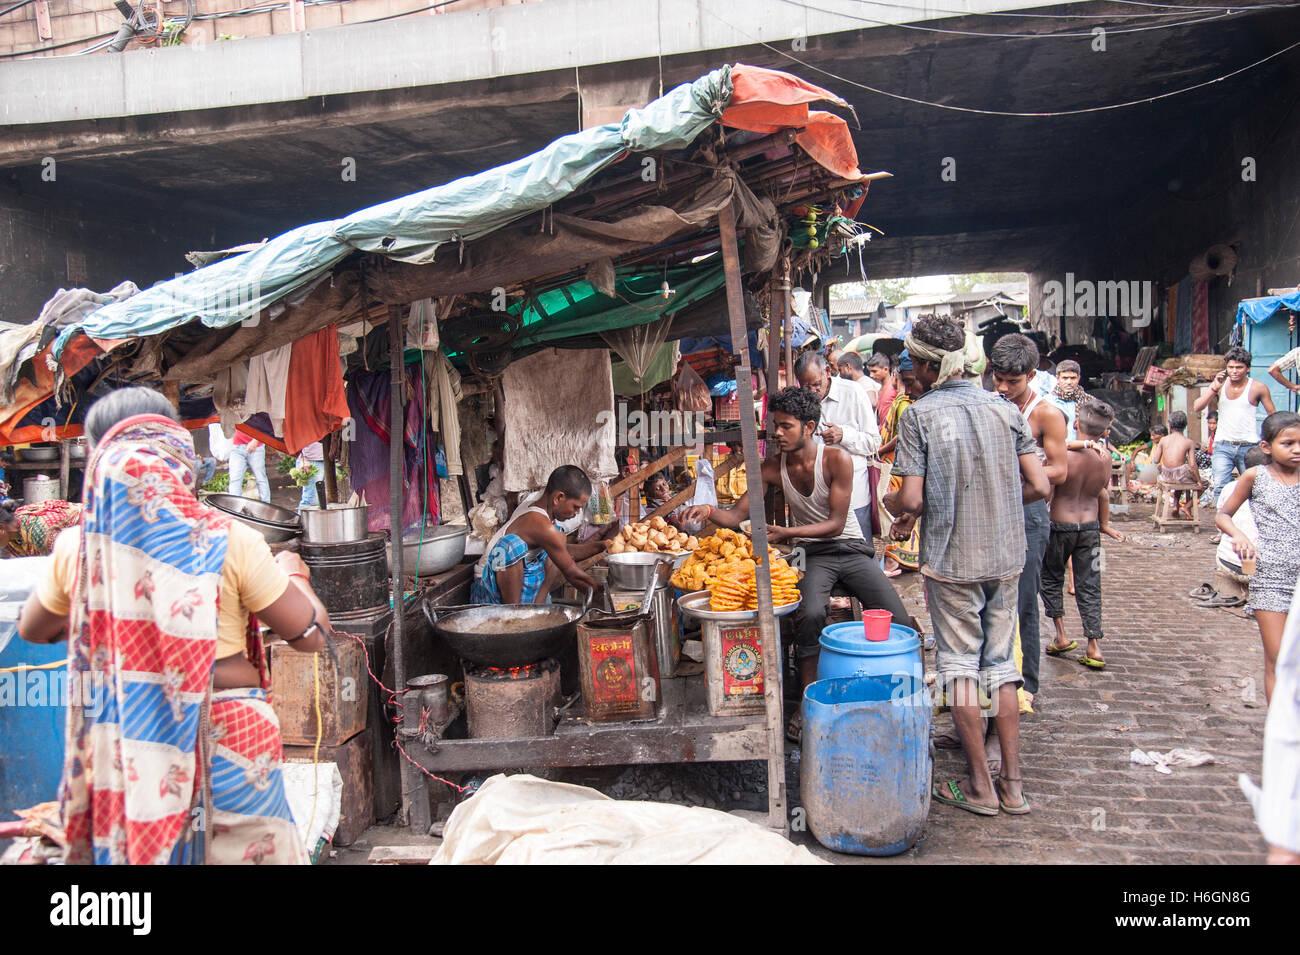 Street food vendor shop near  howrah bridge  at Kolkata West  Bengal India. - Stock Image